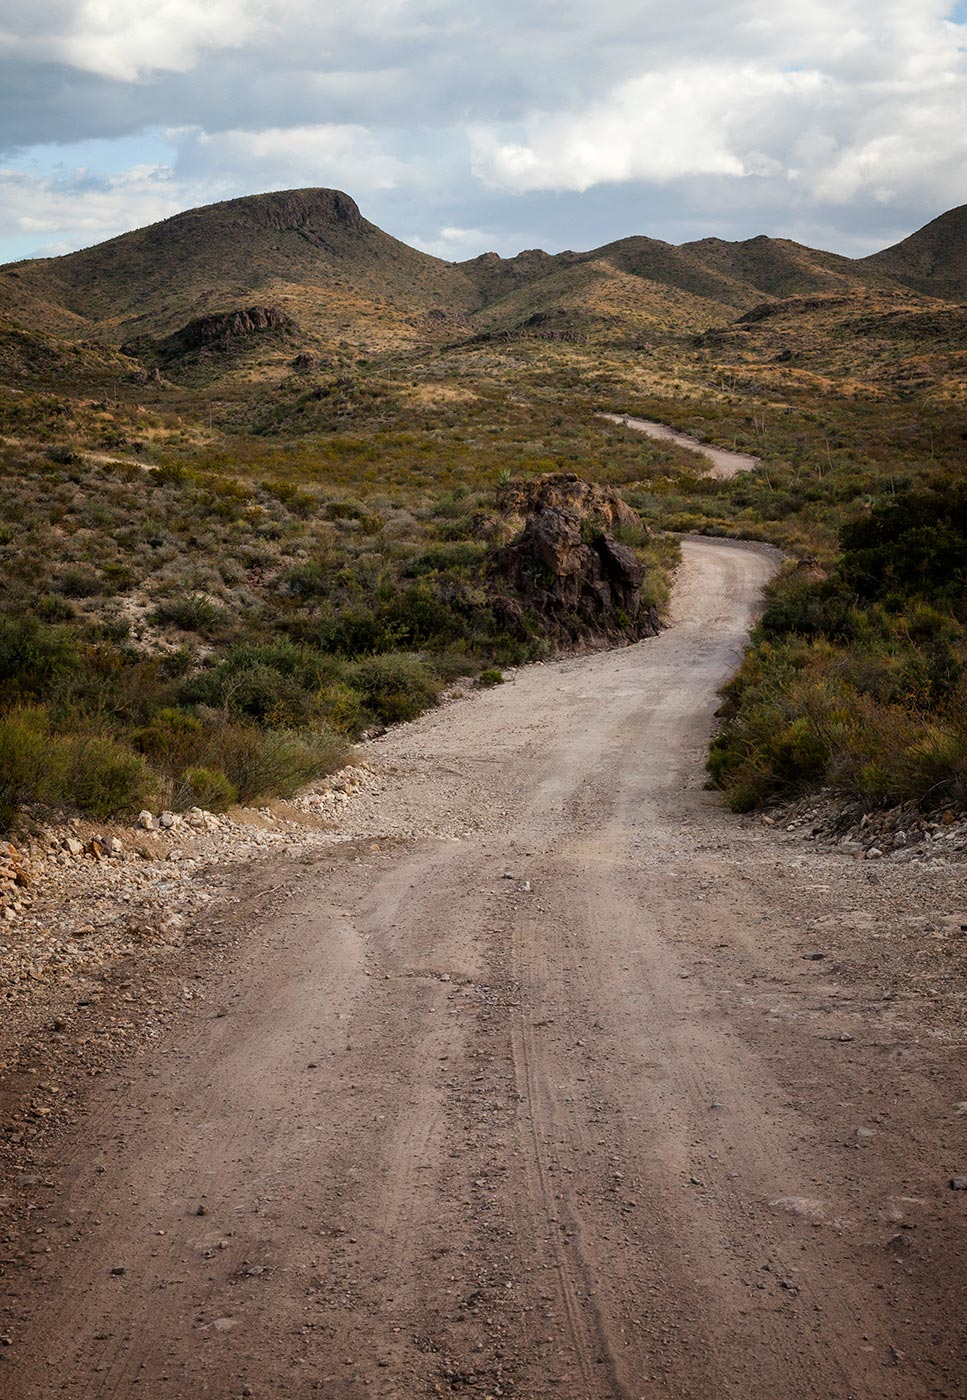 Trans-Pecos-Ultra-ABP-Agua-Adentro_Main-Road2.jpg